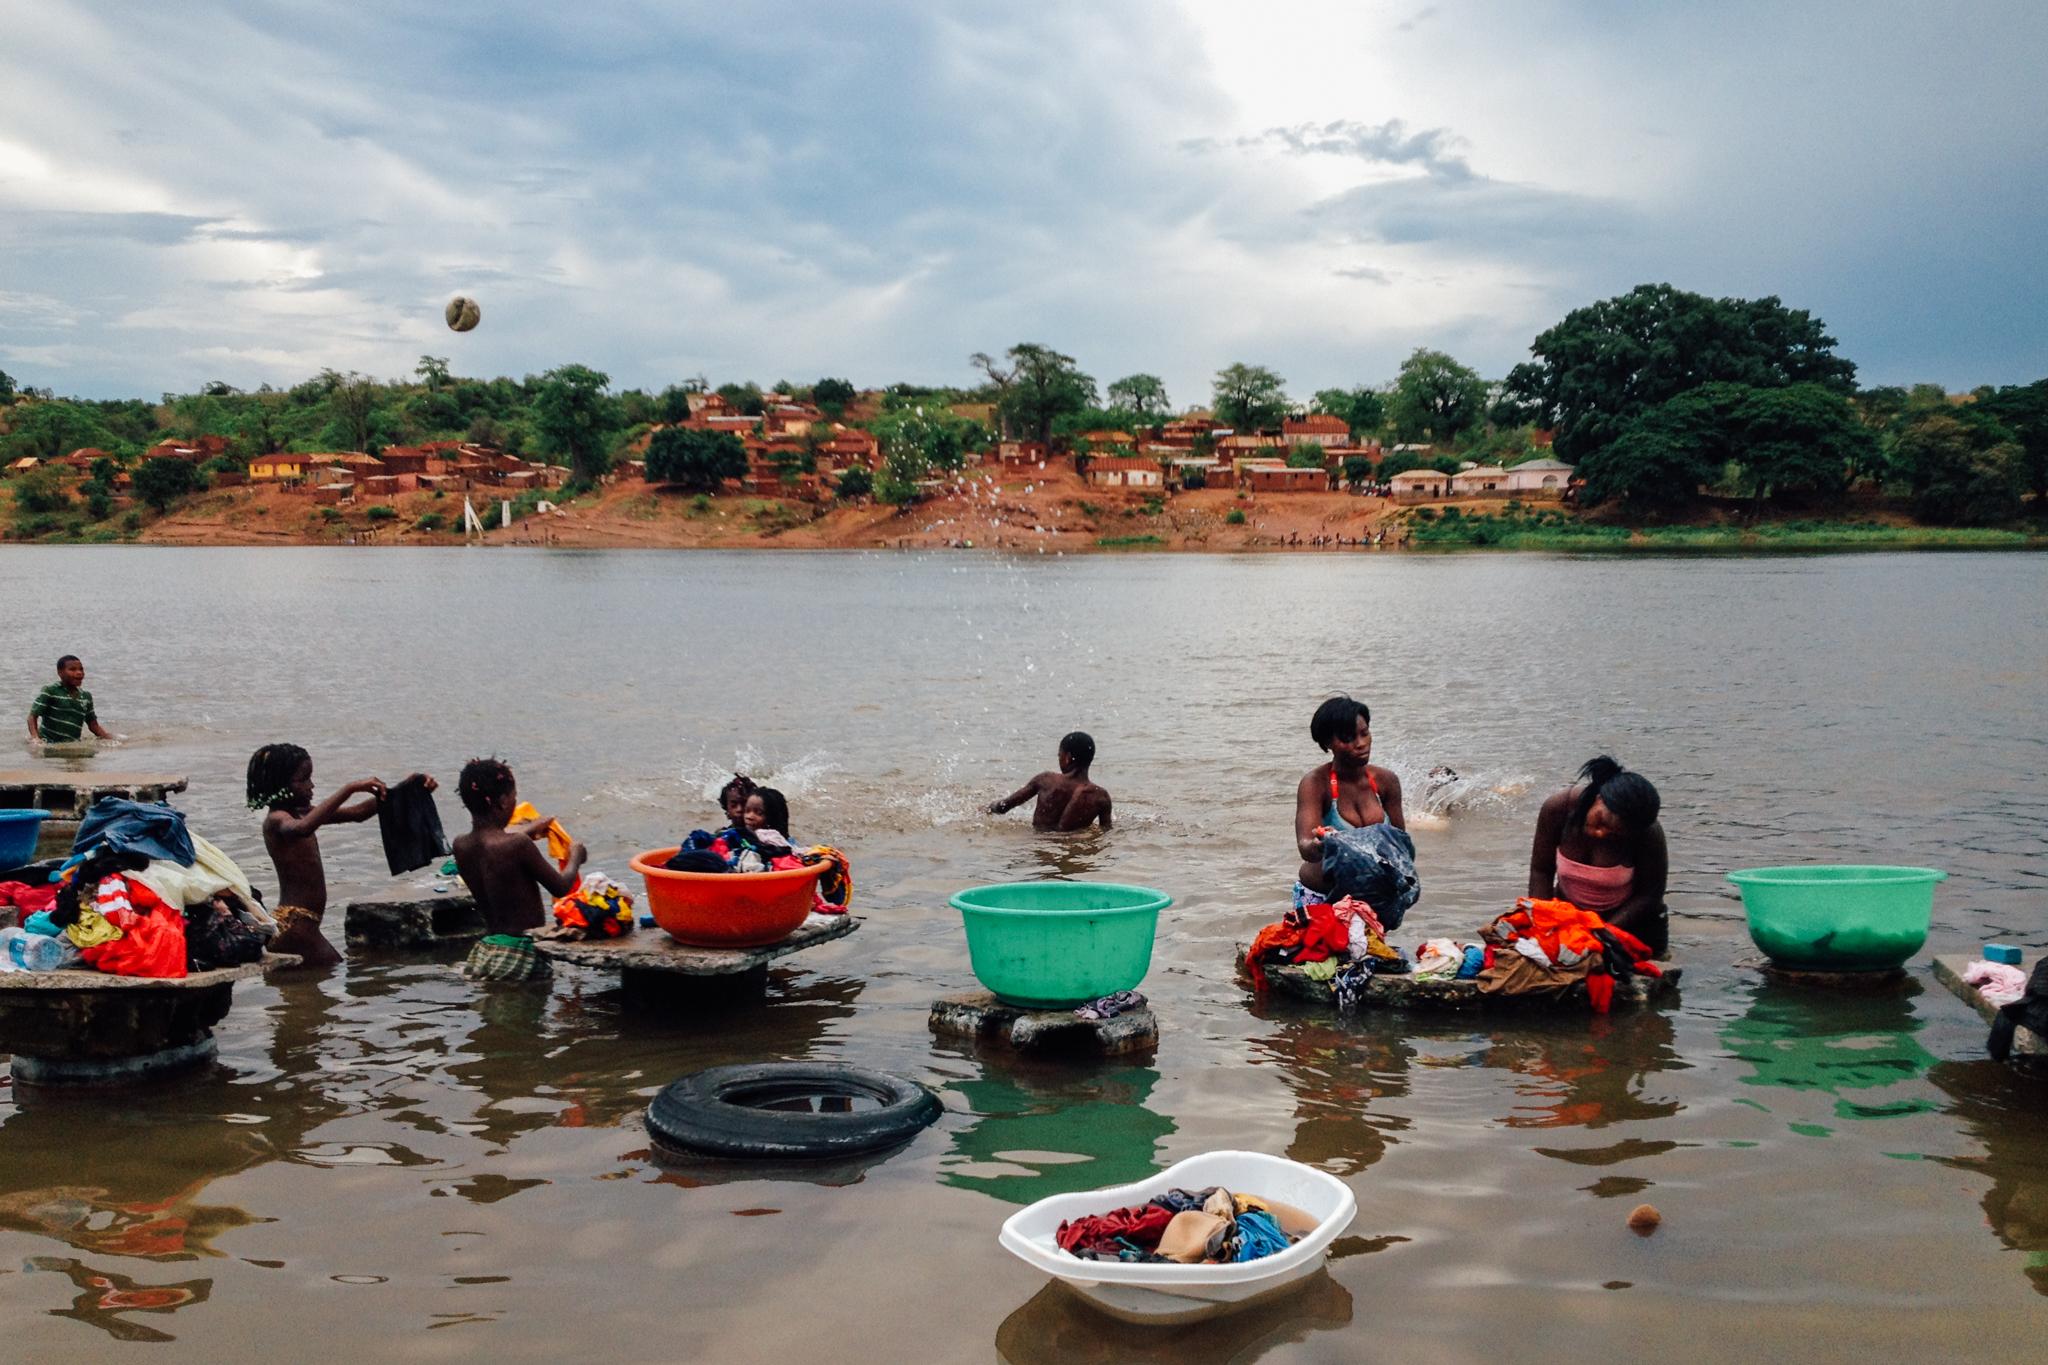 [2014] iPhone 4S - Dondo, Angola